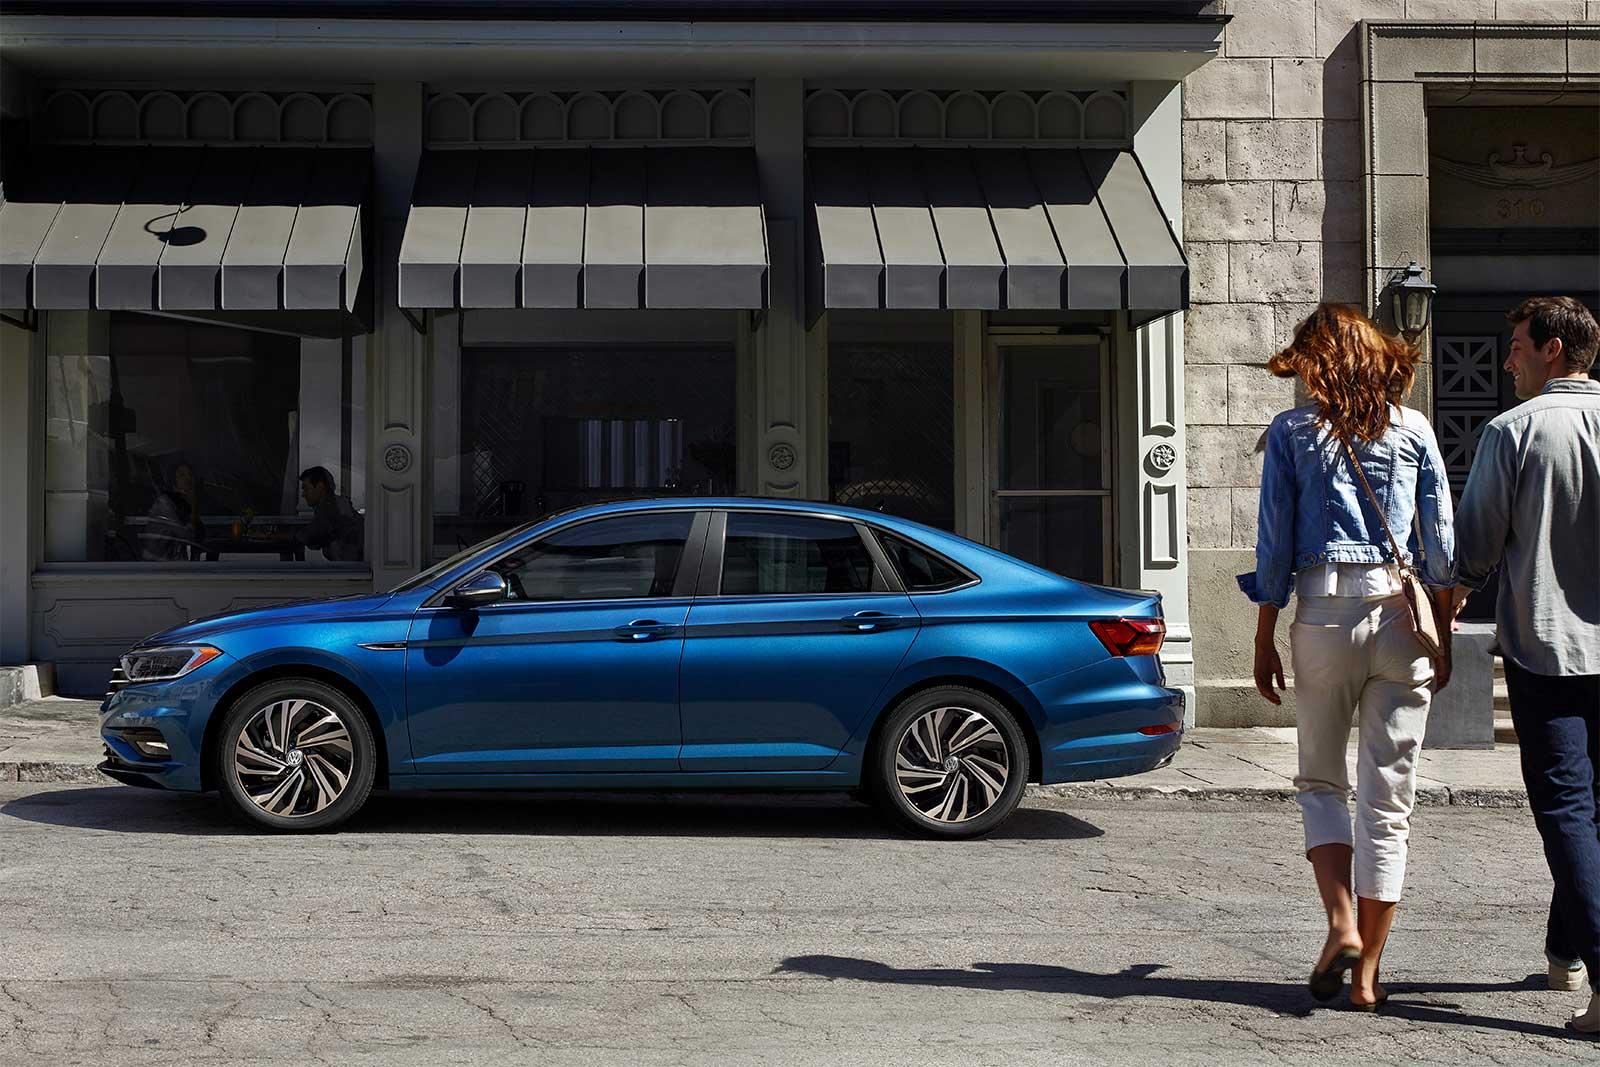 The 2019 Volkswagen Jetta Get Refreshing Redesign Heritage